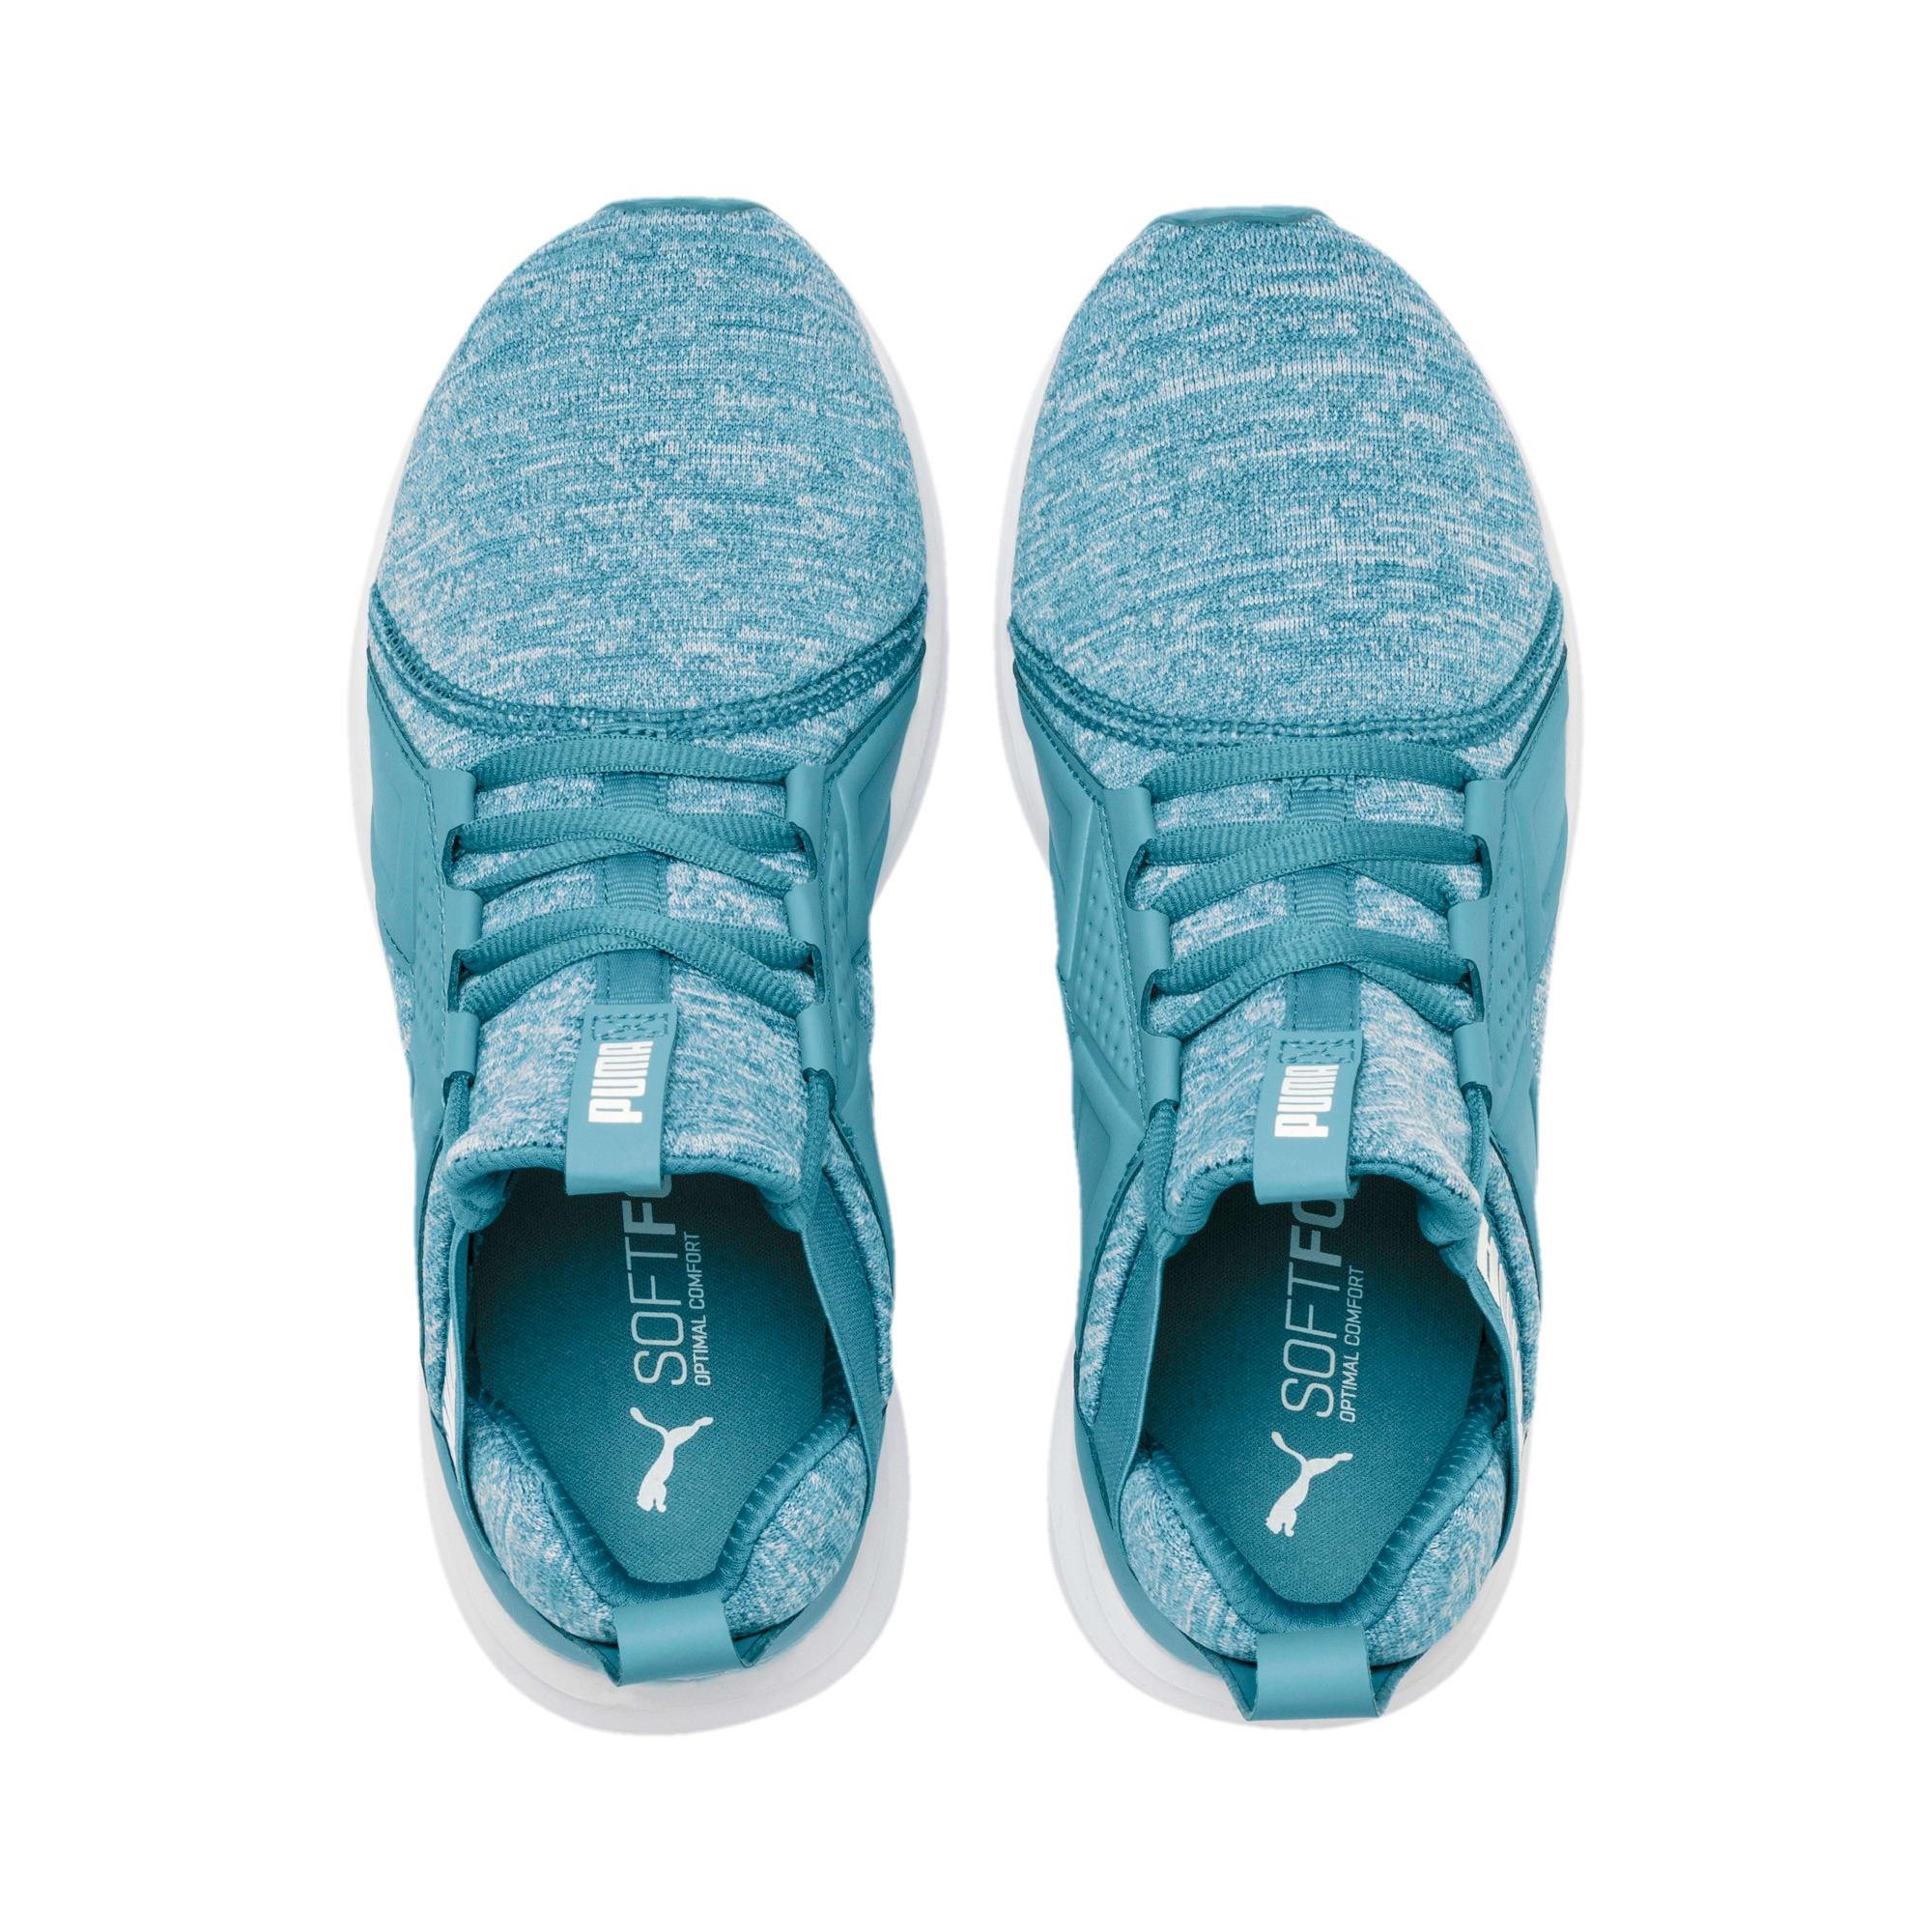 Thumbnail 7 of Enzo Heather Women's Sneakers, Bluestone-Milky Blue-White, medium